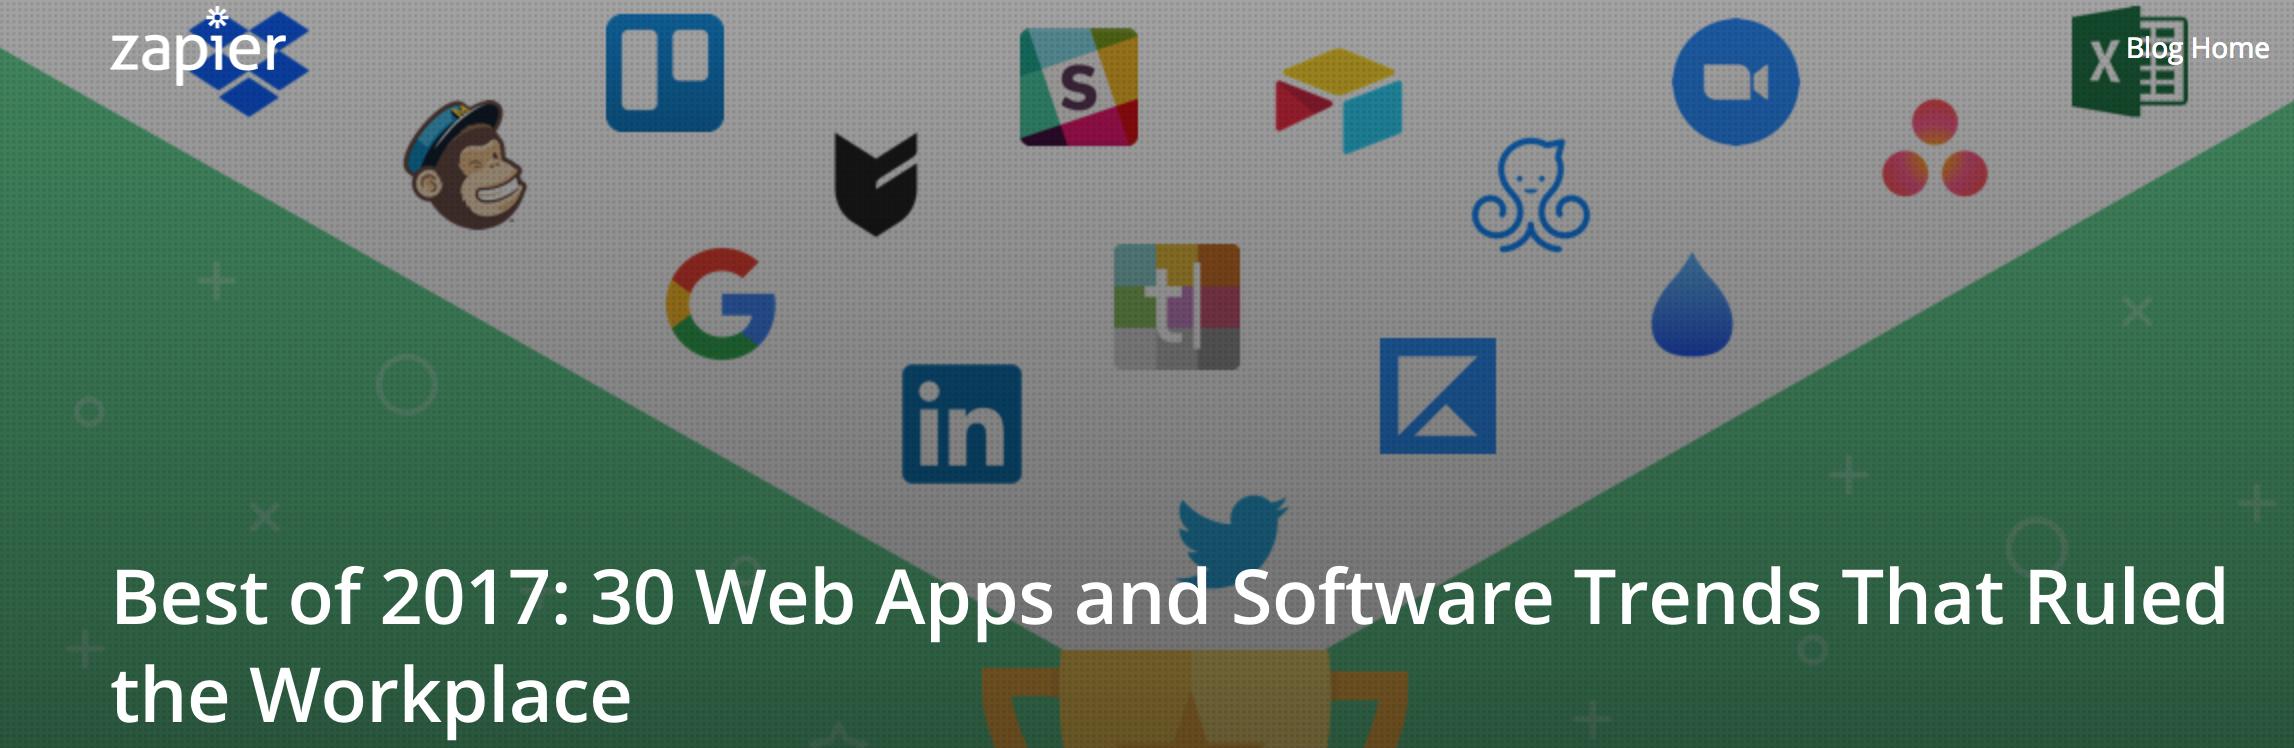 Best of 2017, 30 Web Apps